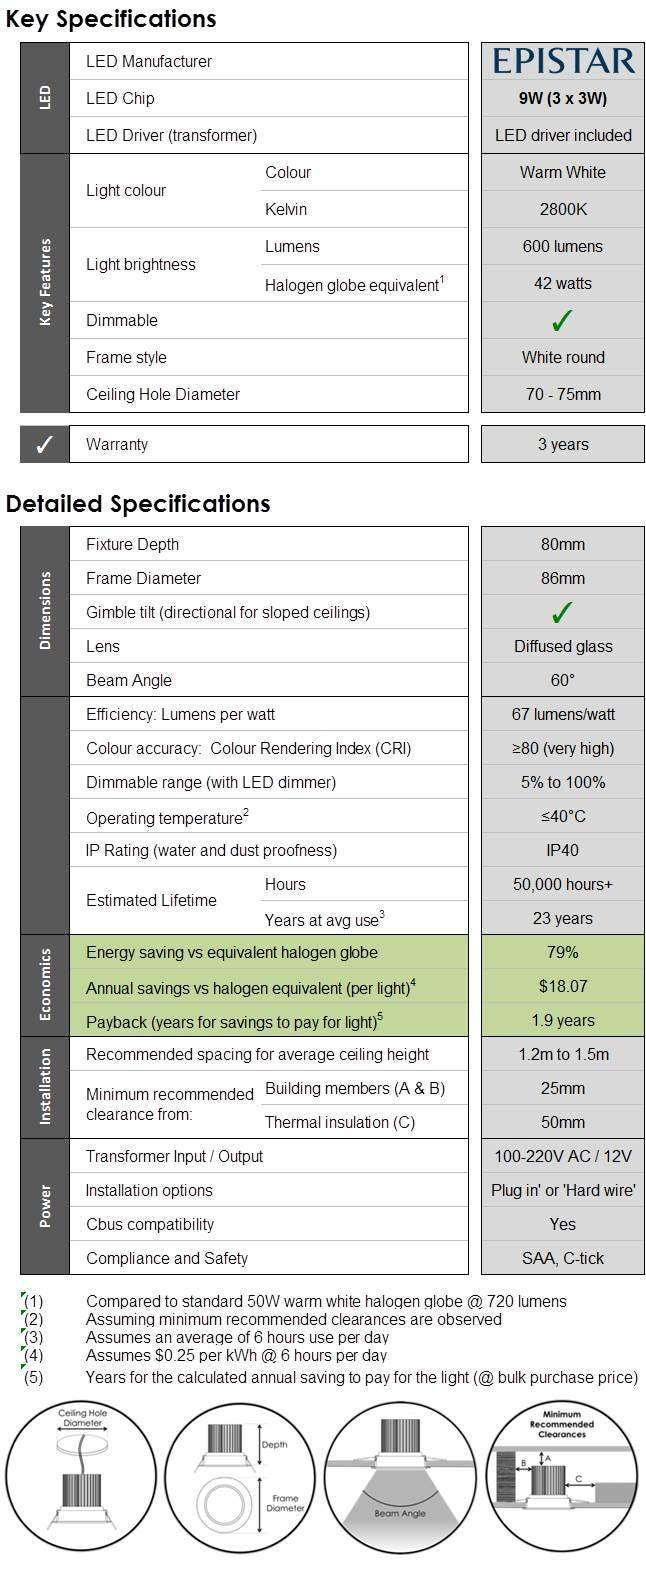 Efficient Epistar LED Downlight